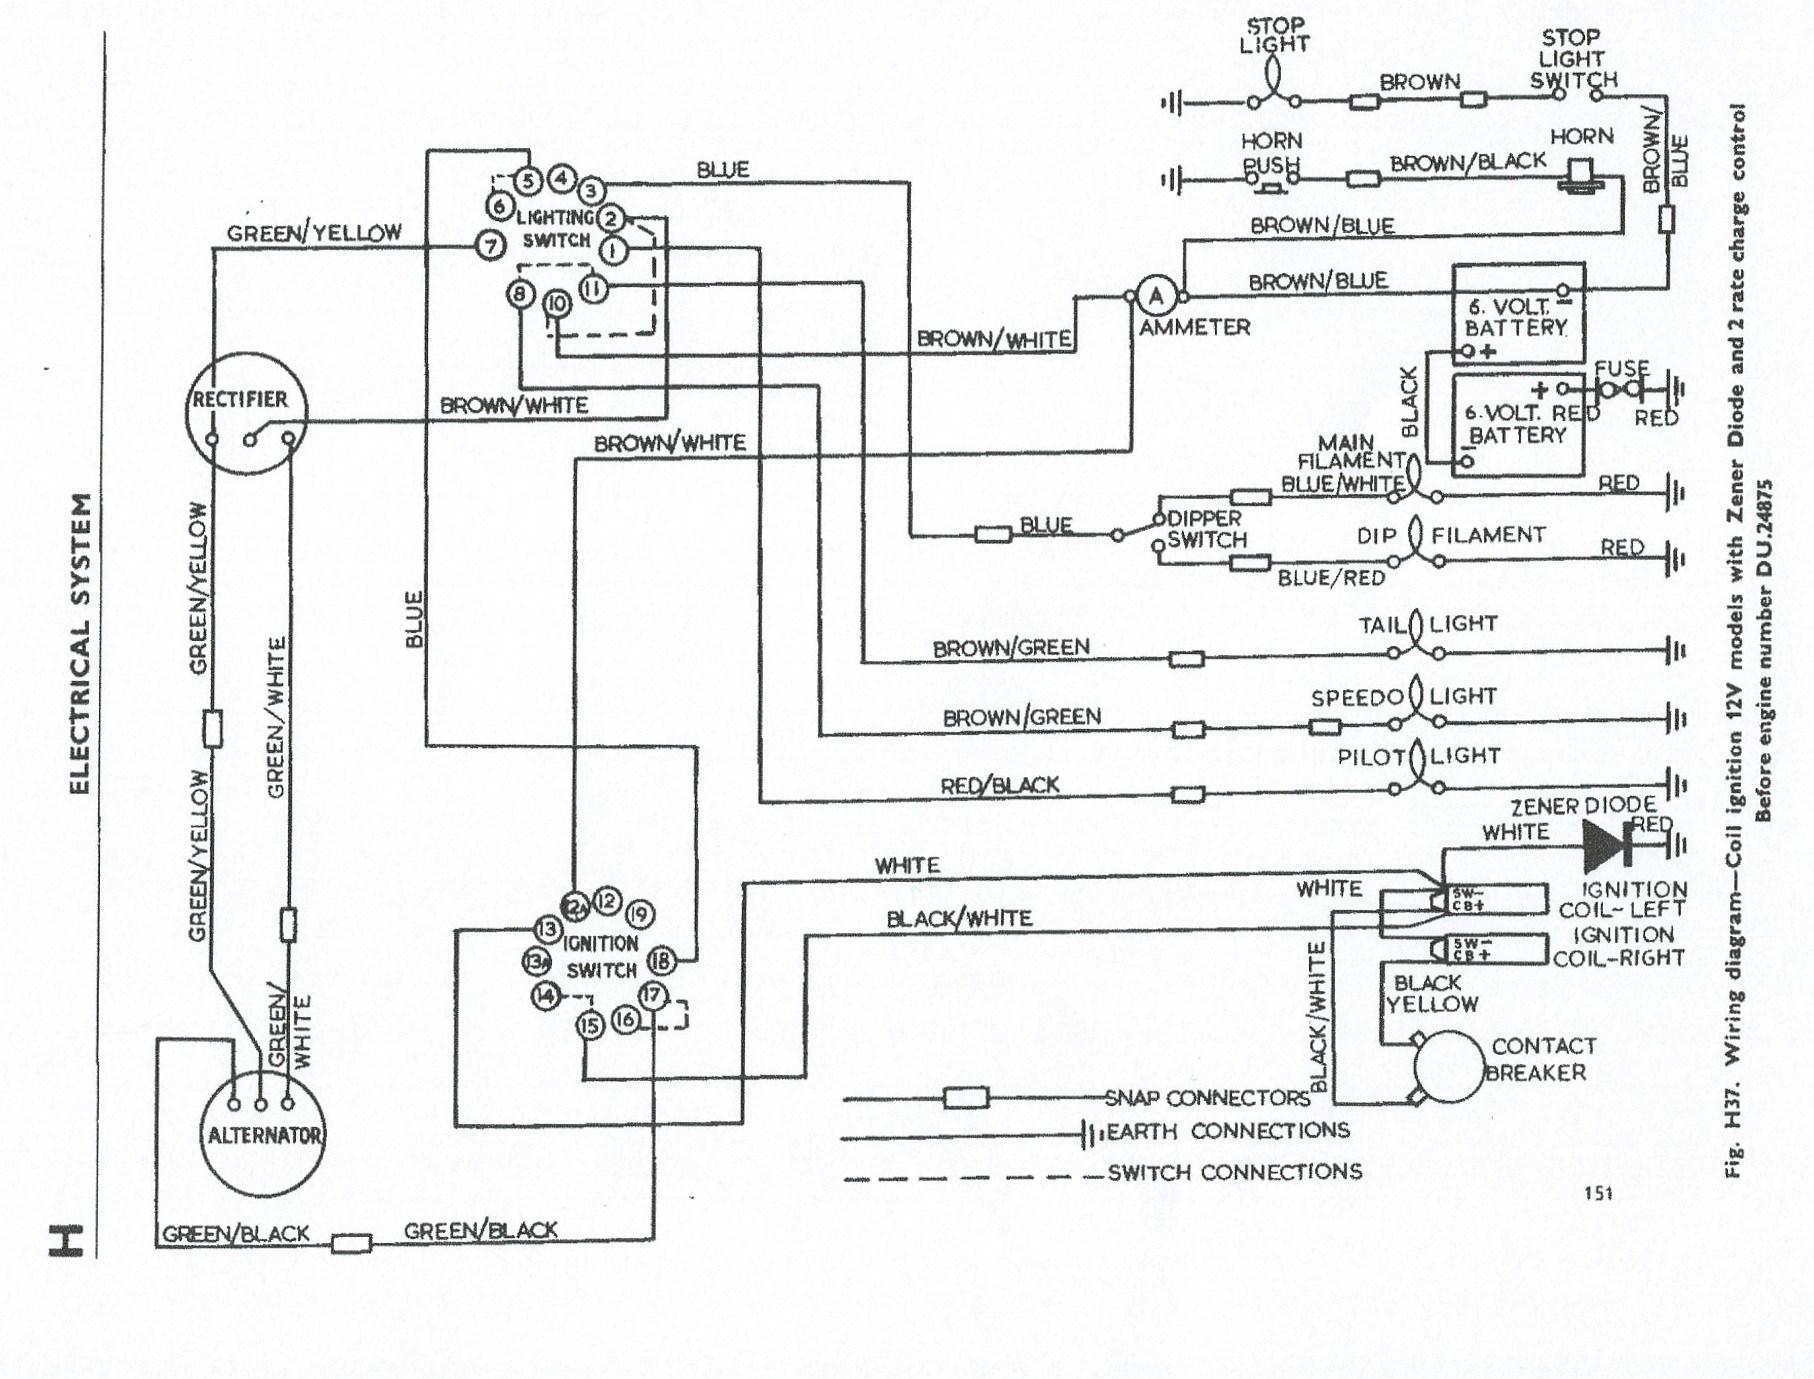 ts_2156] eliminator wiring diagram as well triumph chopper wiring ... sparx wiring diagram triumph  wedab icism sand boapu itive arnes tobiq itis barep lite cajos ...